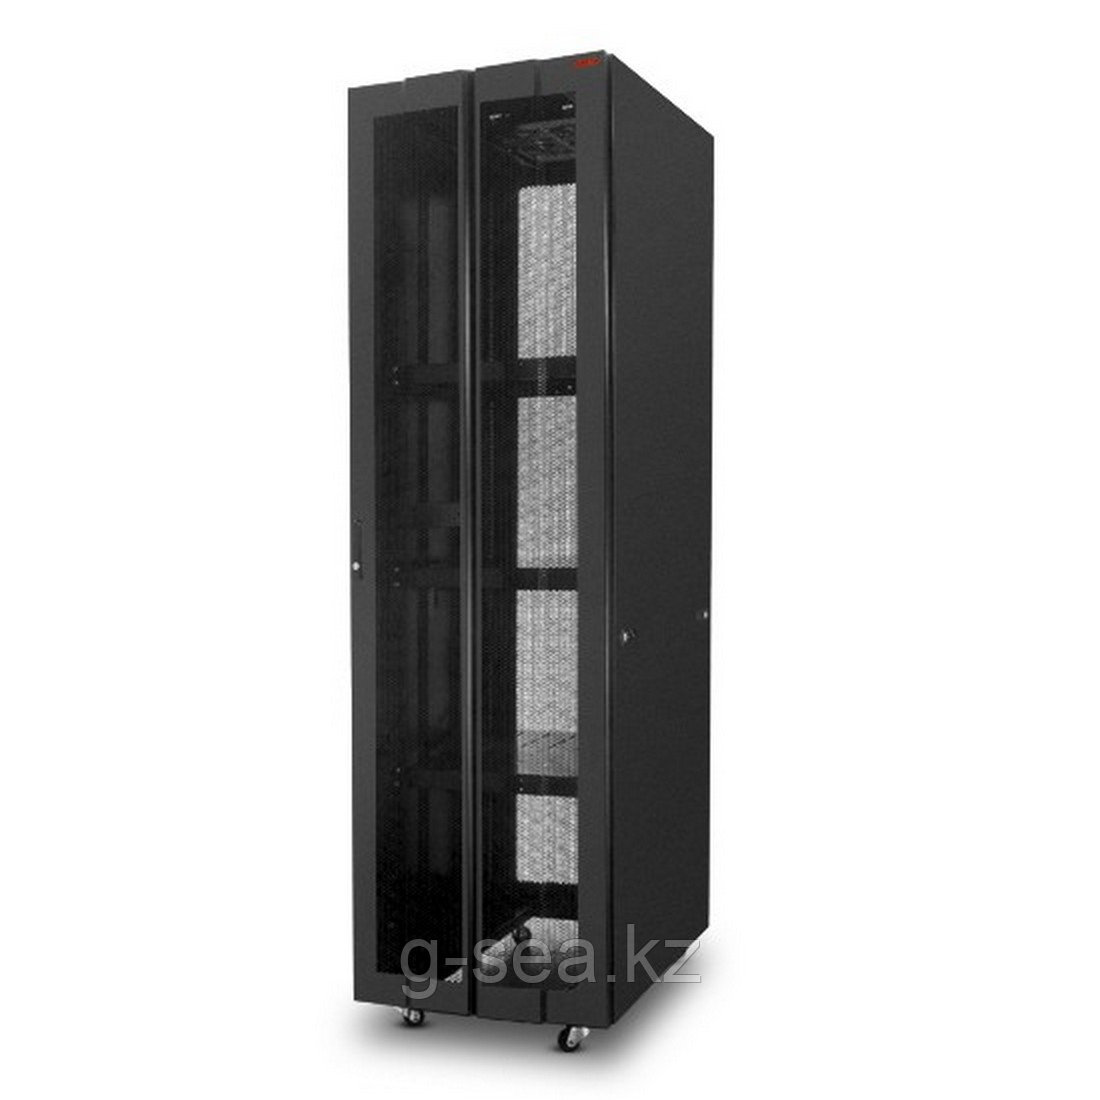 Шкаф серверный SHIP 601S.6842.65.100 42U 600*800*2000 мм